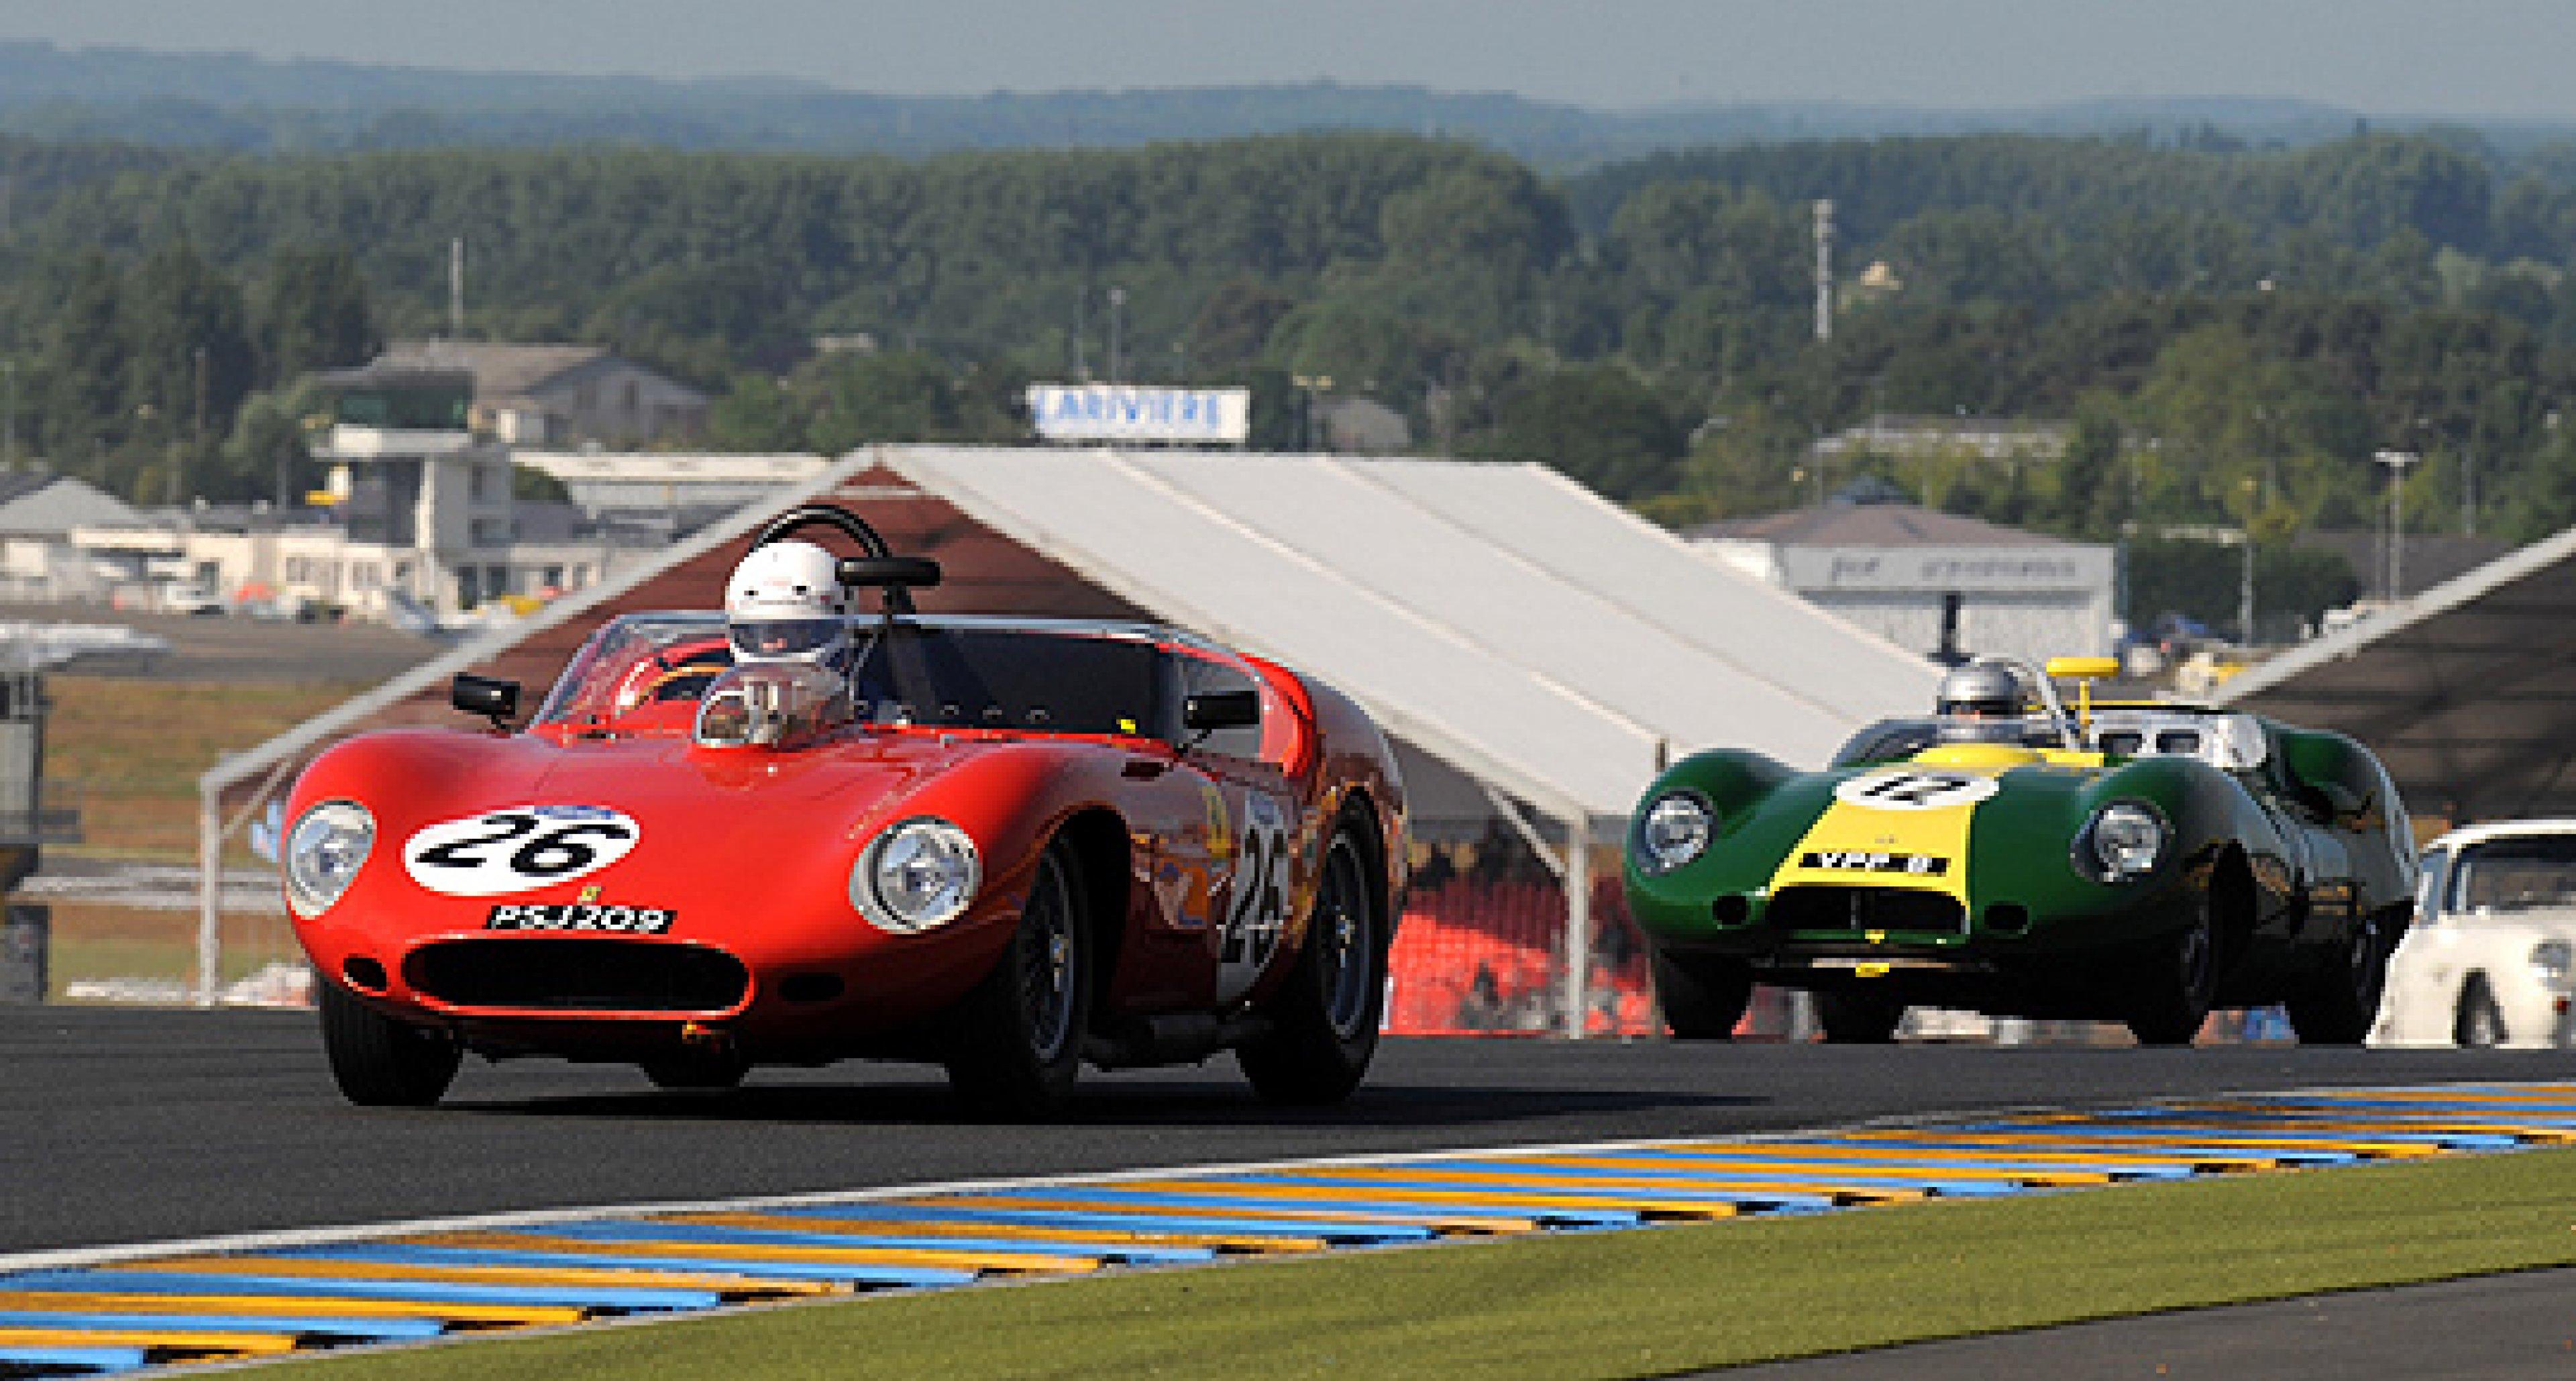 Le Mans Legend 2011: Historic Highlights